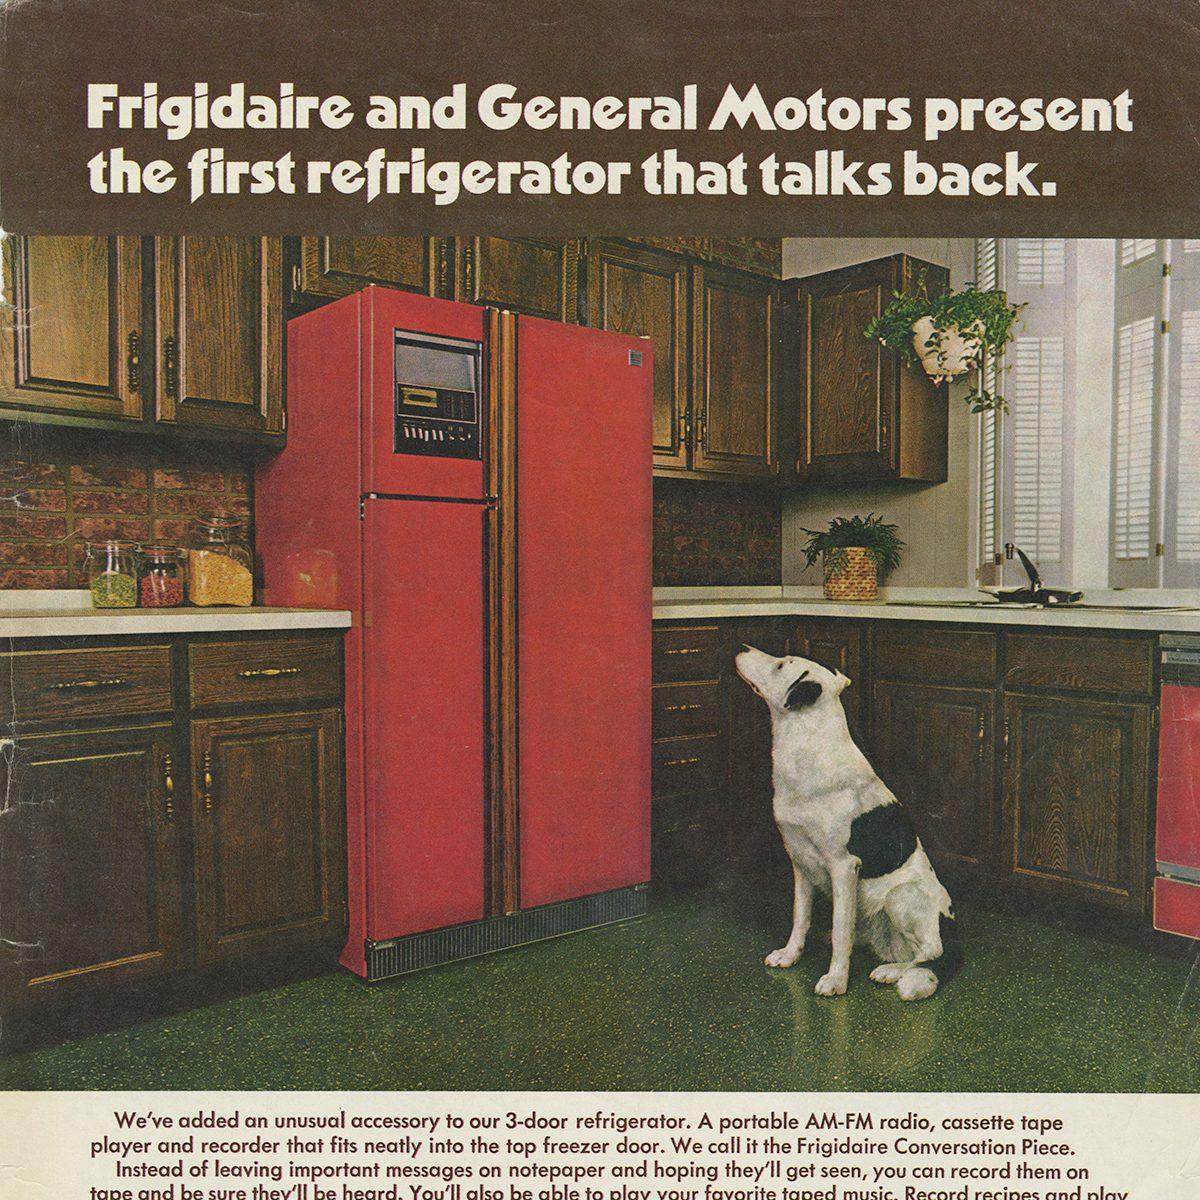 Frigidaire/General Motors Refrigerator ad